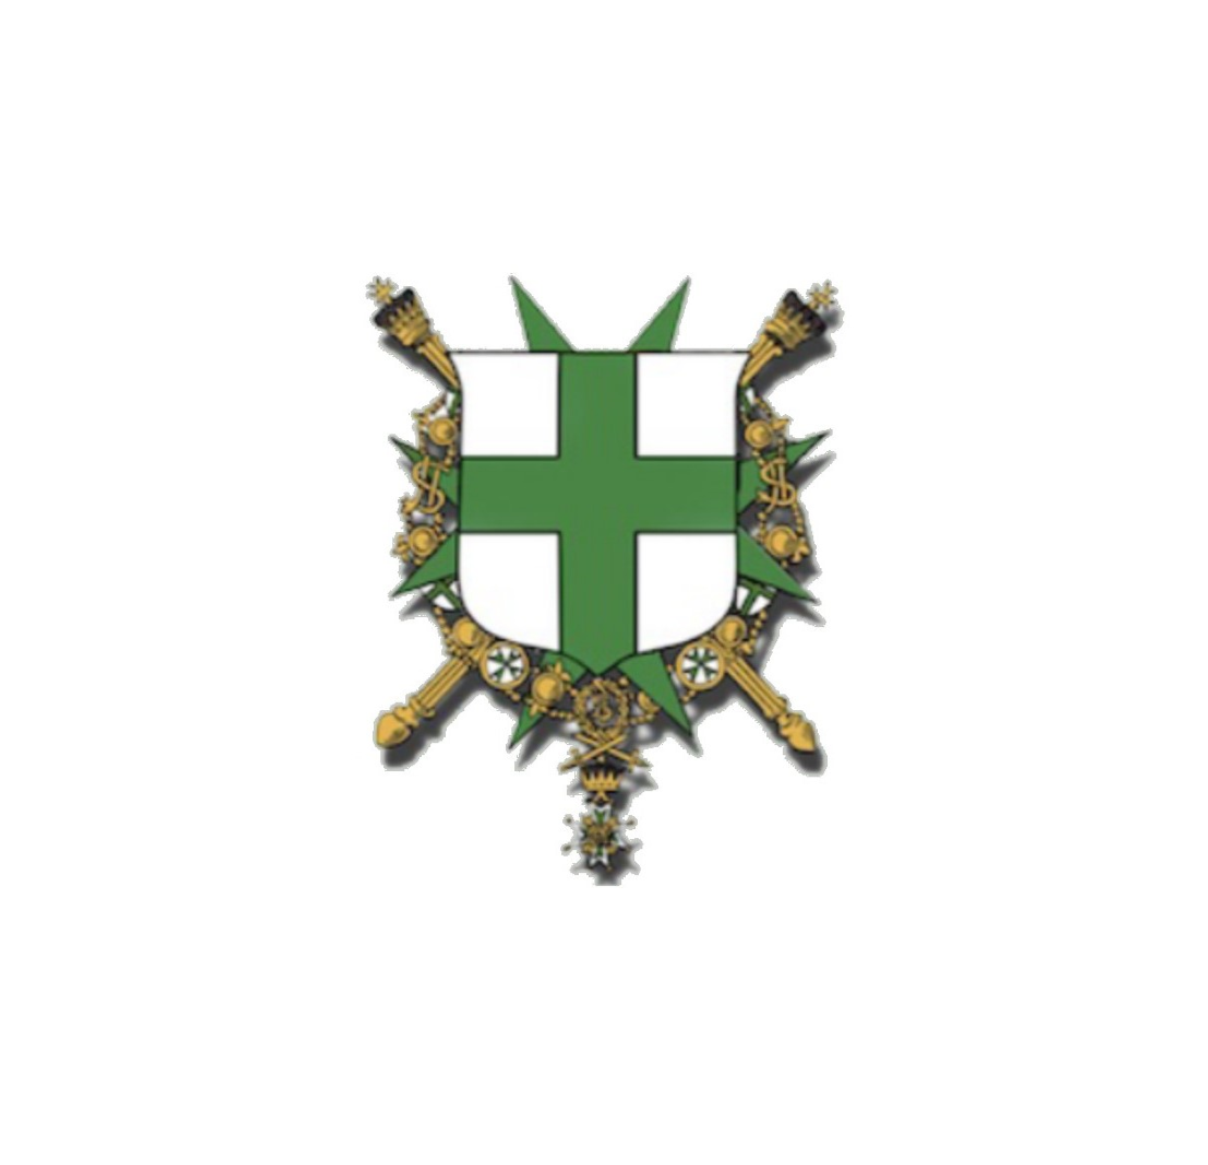 constitutional charter - Military & Hospitaller Order of Saint Lazarus of Jerusalem